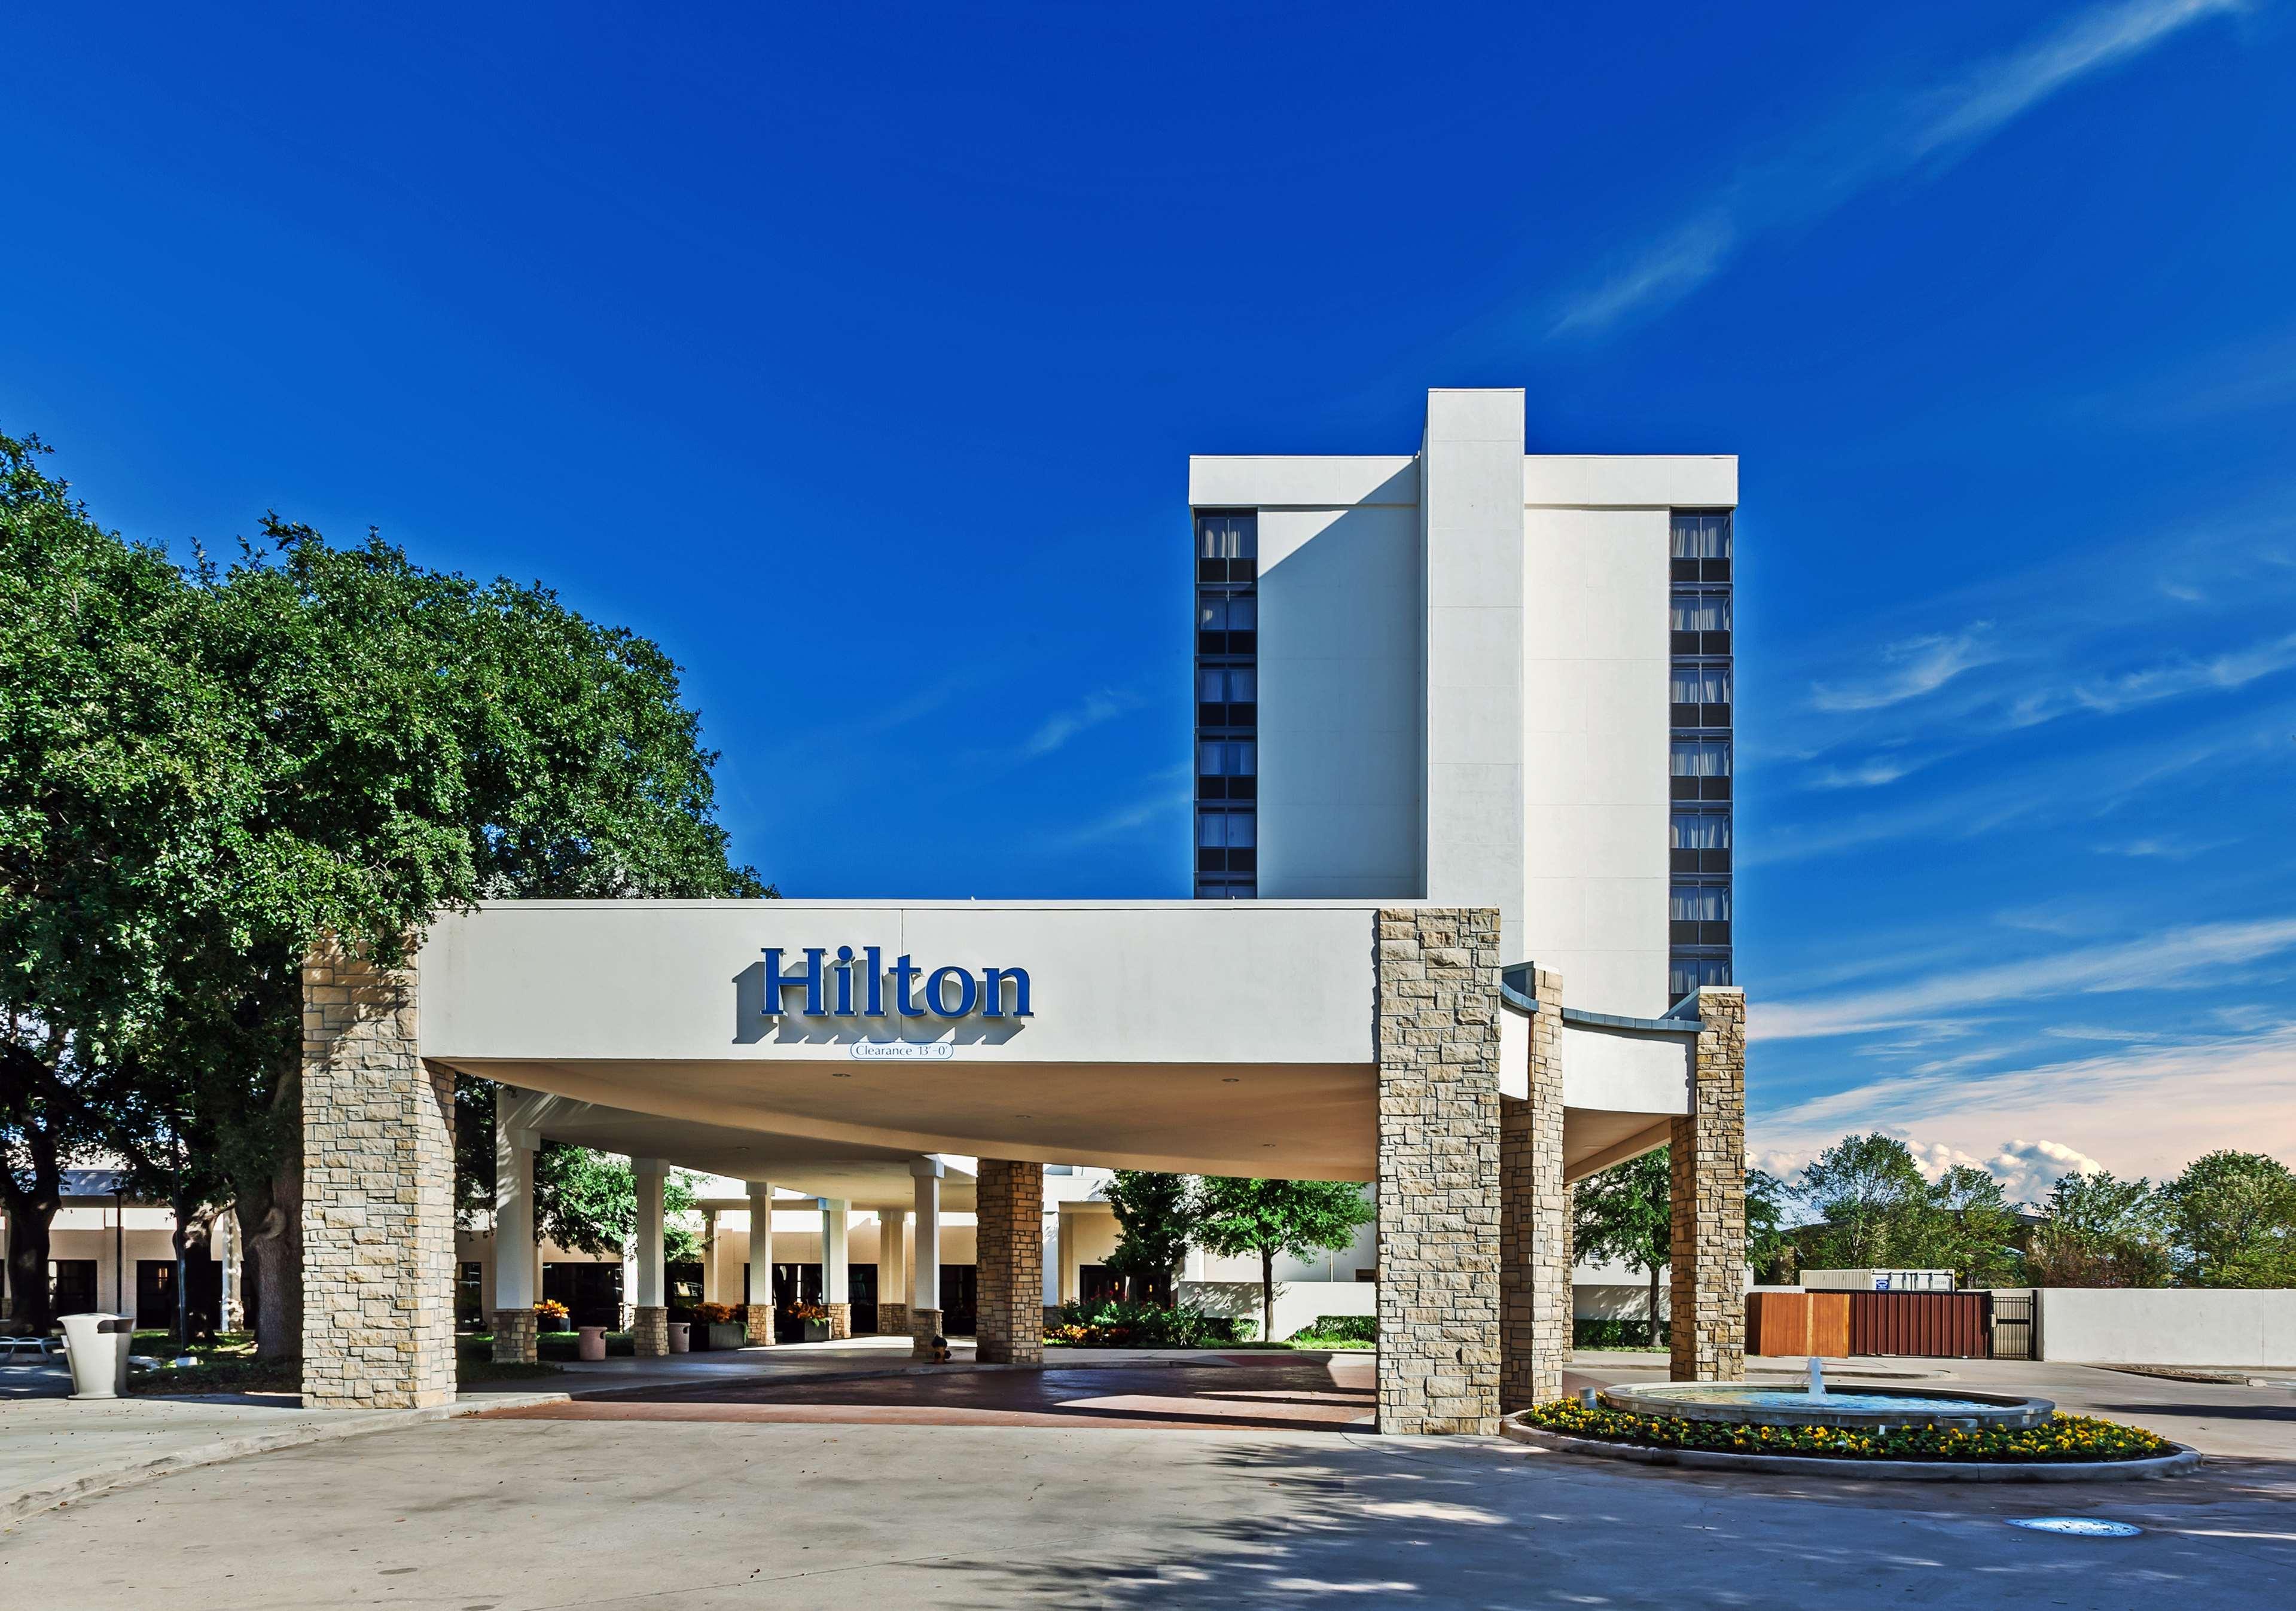 Hilton Waco image 10